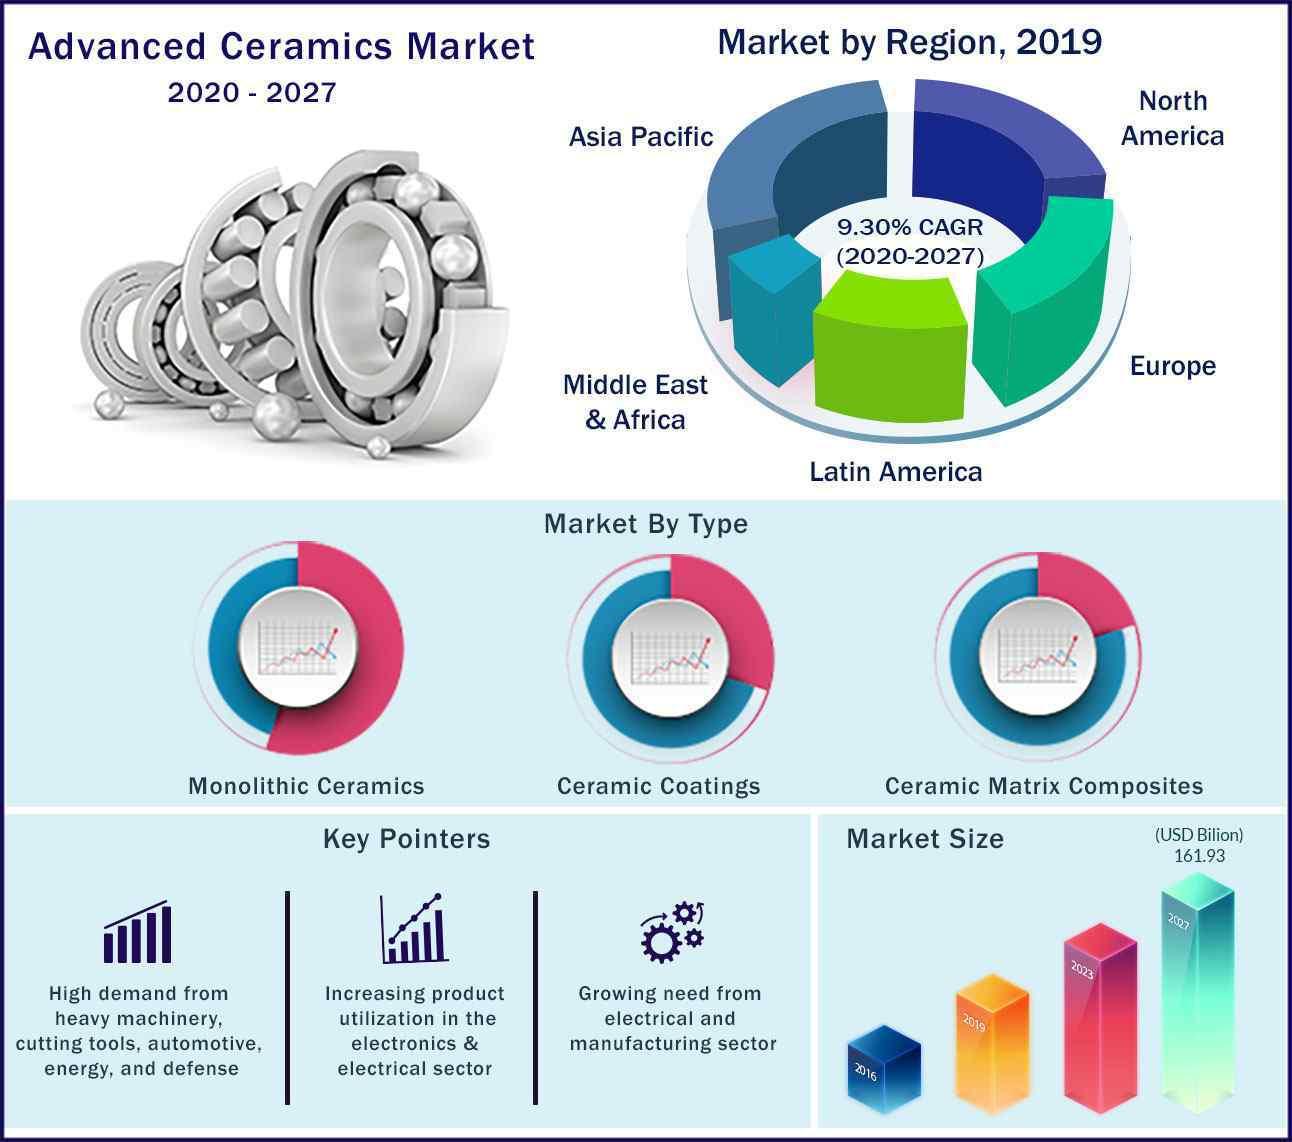 Global Advanced Ceramics Market 2020 to 2027